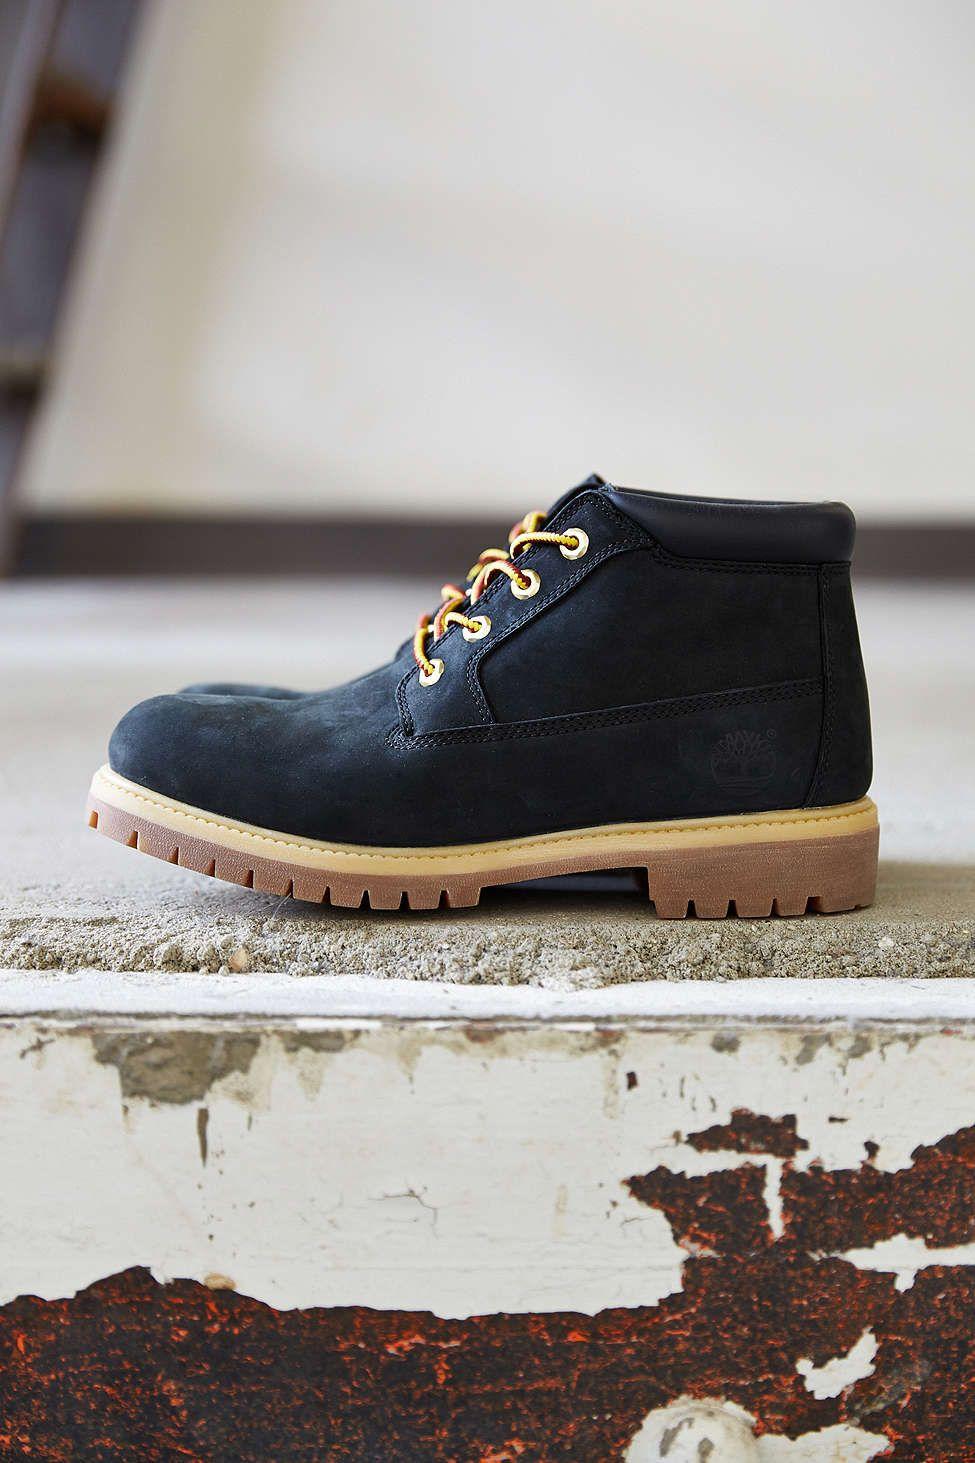 Timberland X UO Chukka Boot | urban flat styling and